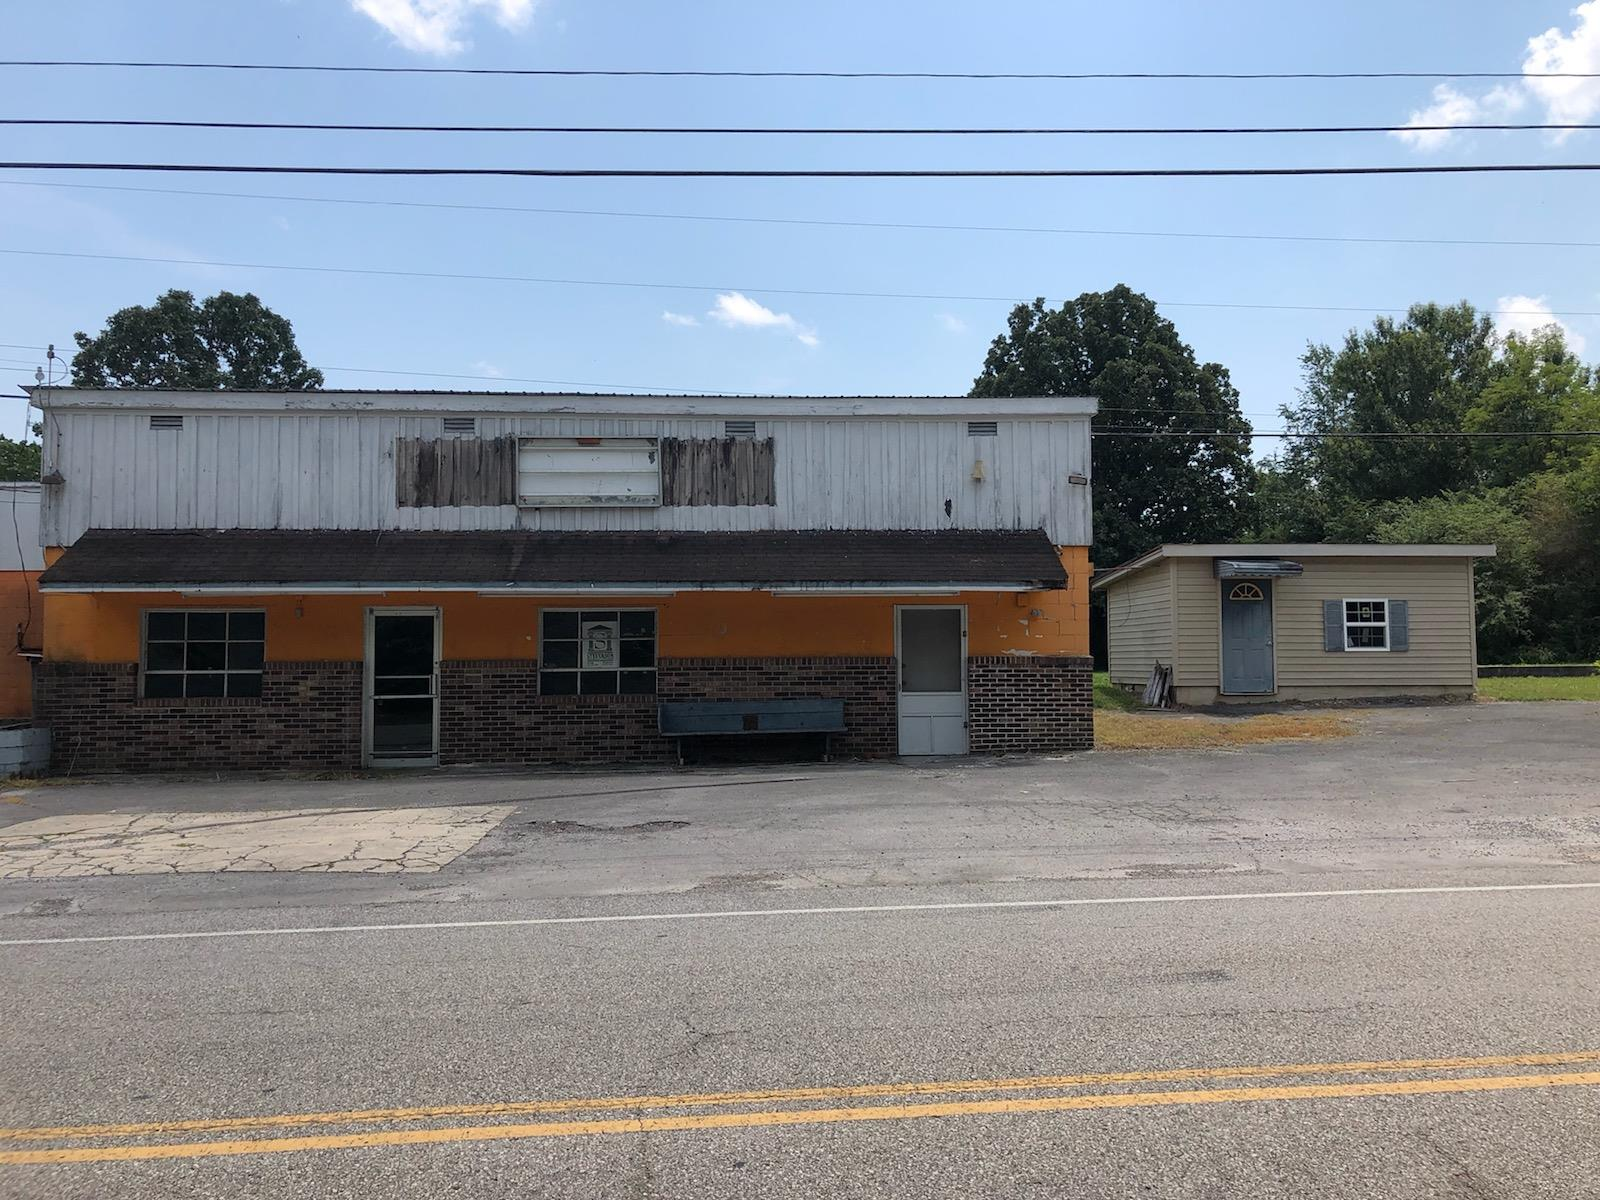 2105 W Lincoln St, Tullahoma, TN 37388 - Tullahoma, TN real estate listing